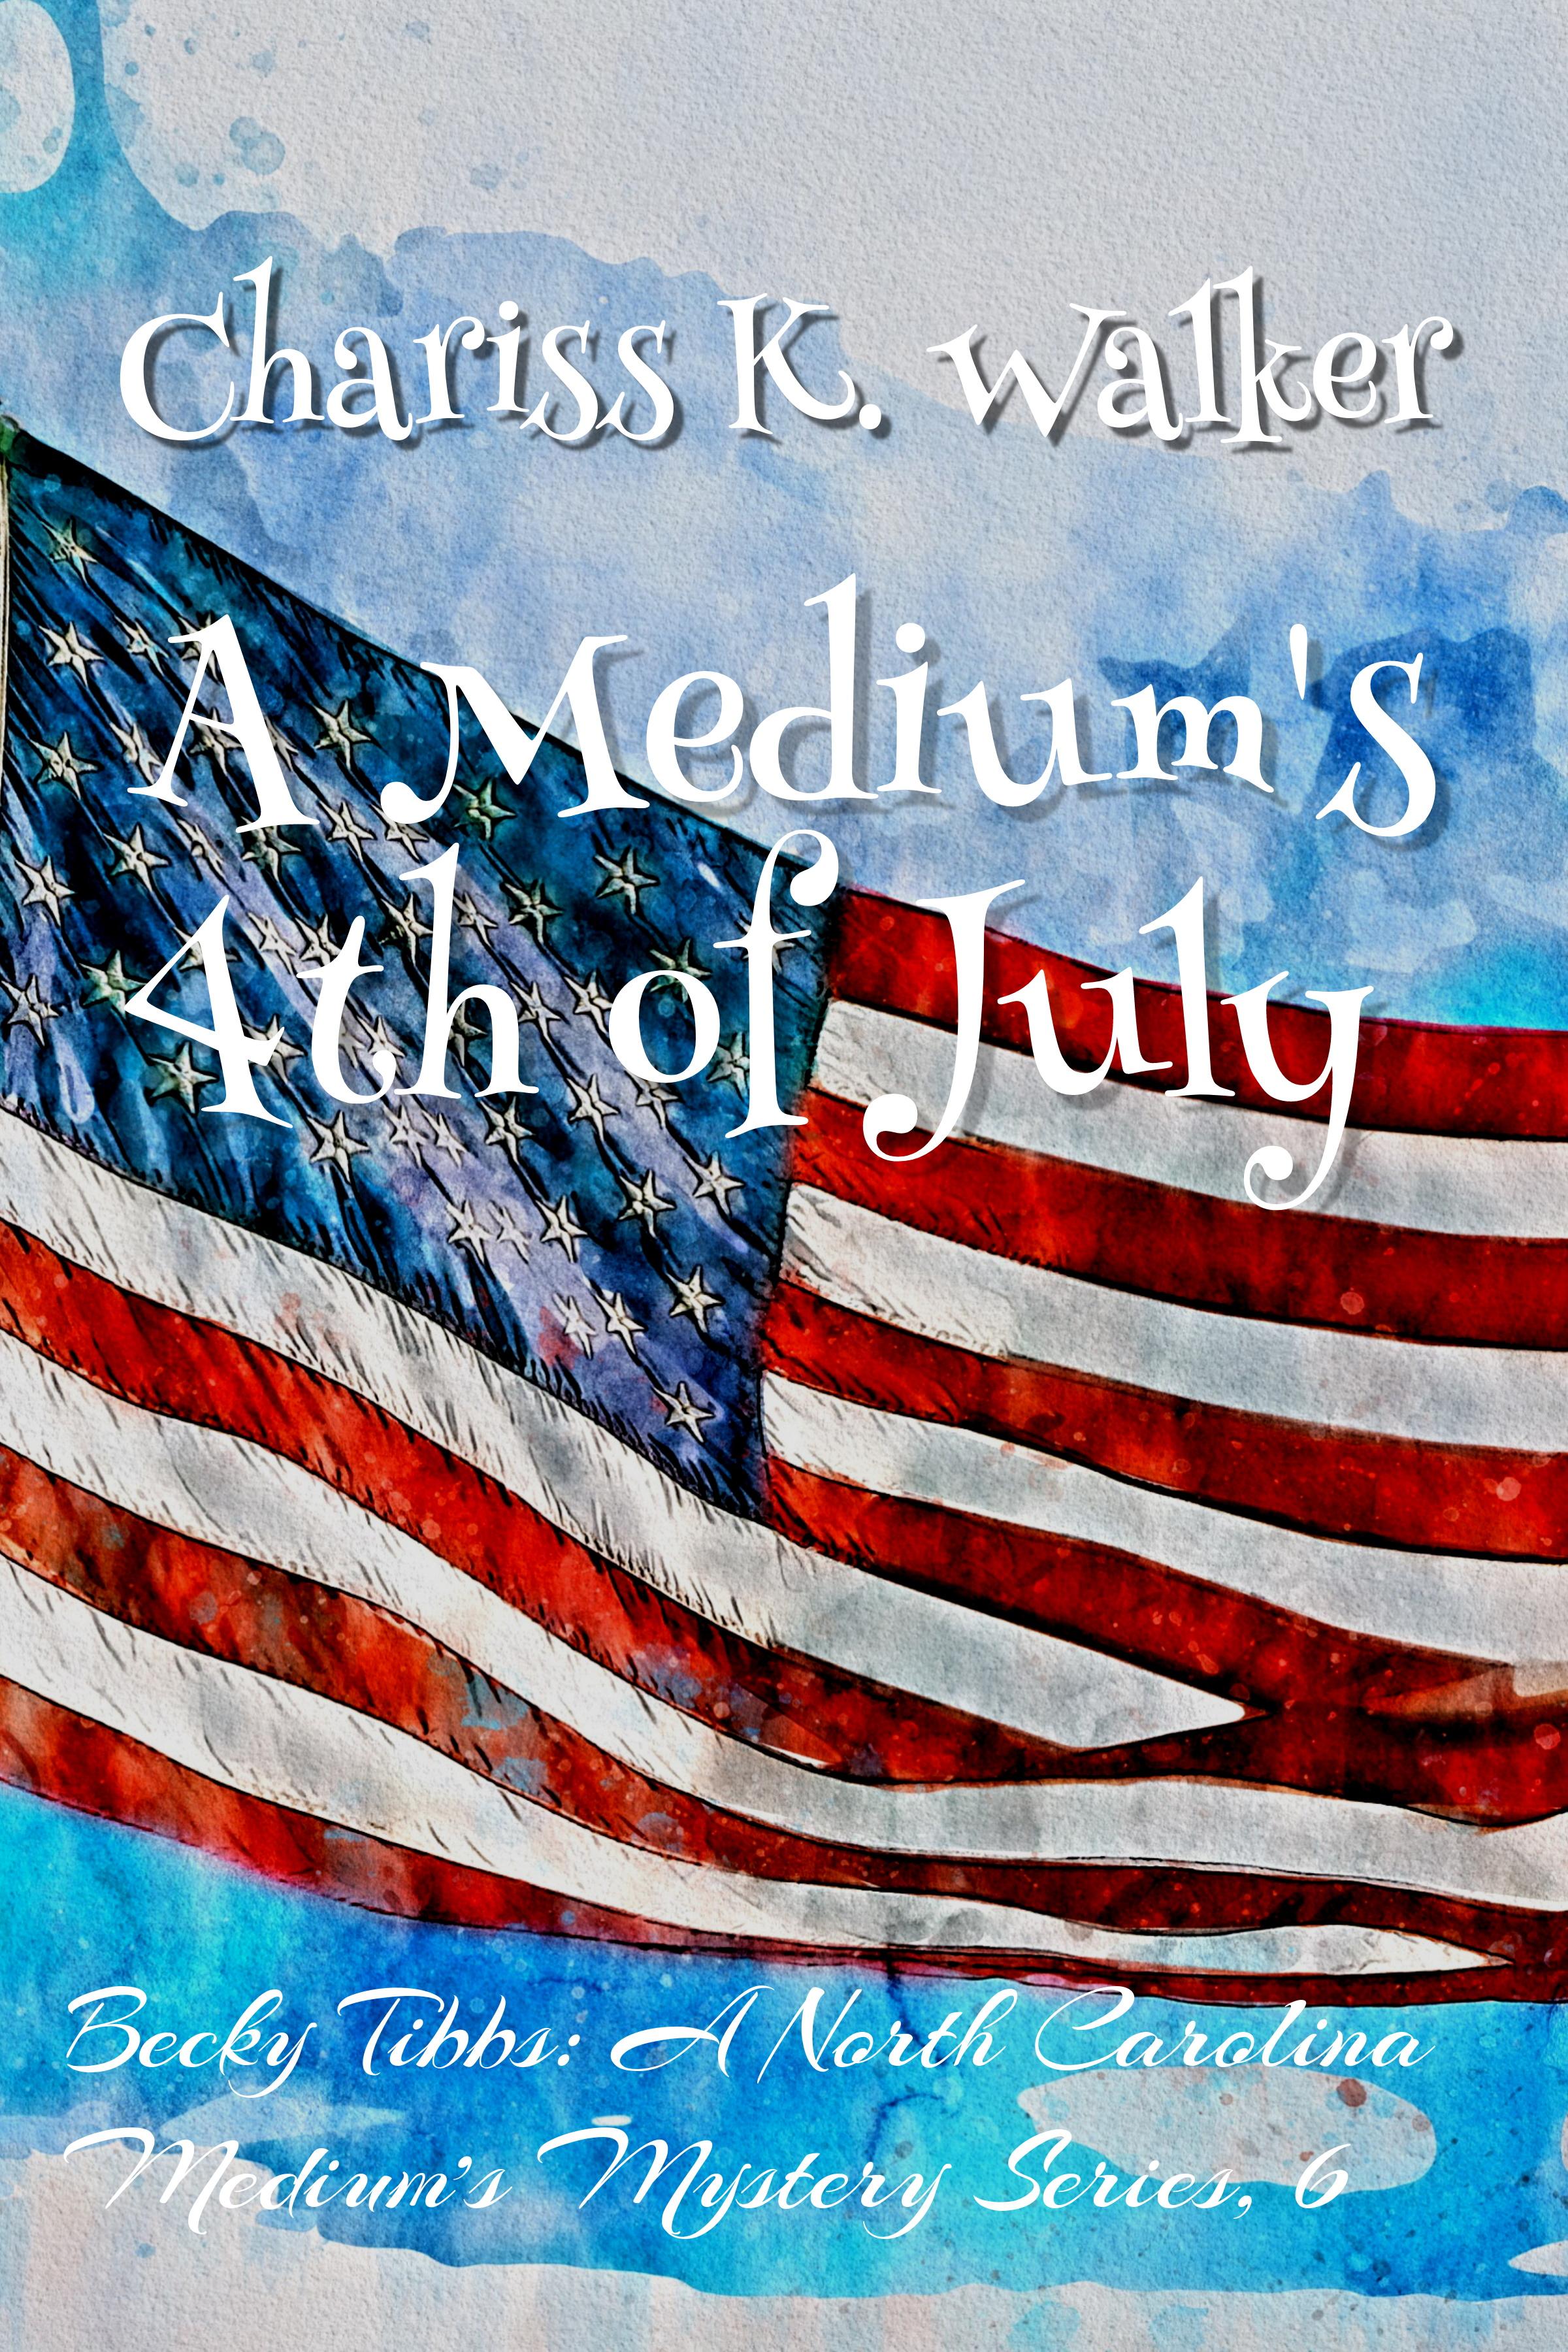 [PDF] [EPUB] A Medium's 4th of July (Becky Tibbs: A North Carolina Medium's Mystery Series, #6) Download by Chariss K. Walker